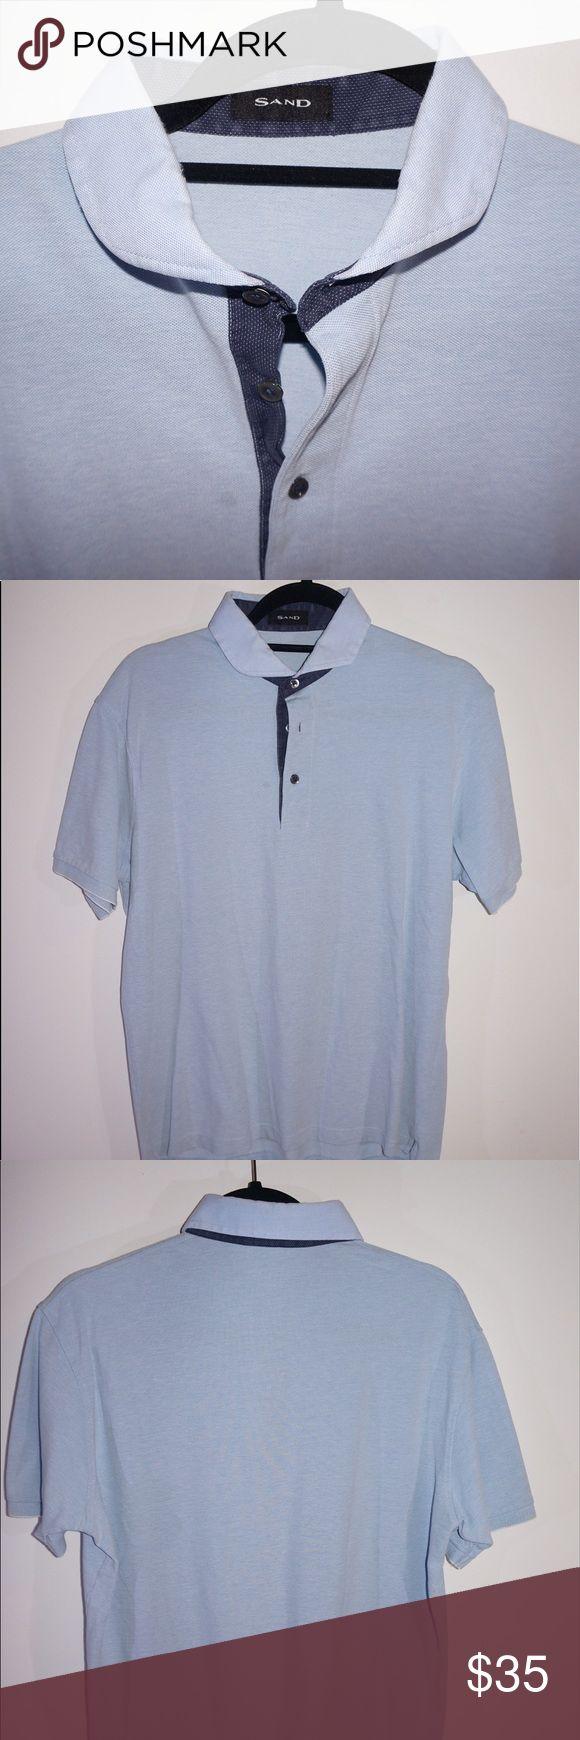 SAND Polo Shirt Light blue polo shirt with navy blue collar trim. Sand Shirts Polos